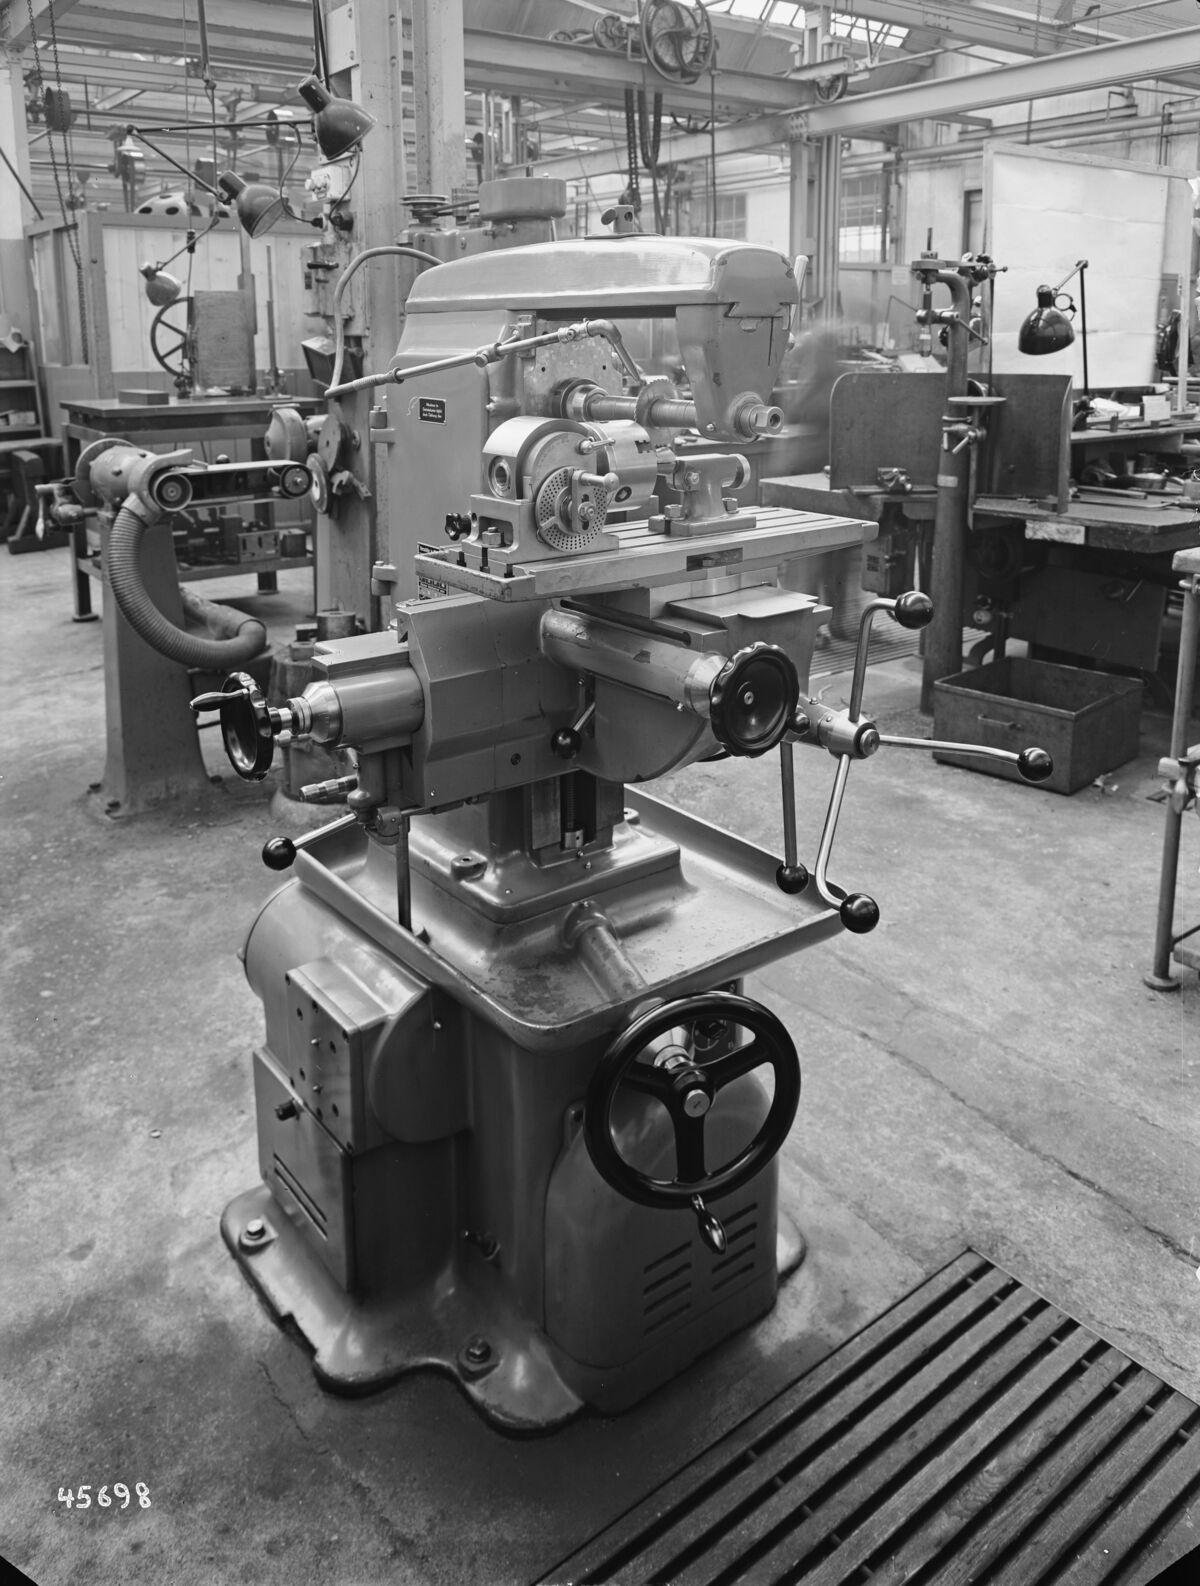 GFA 16/45698: Milling machine